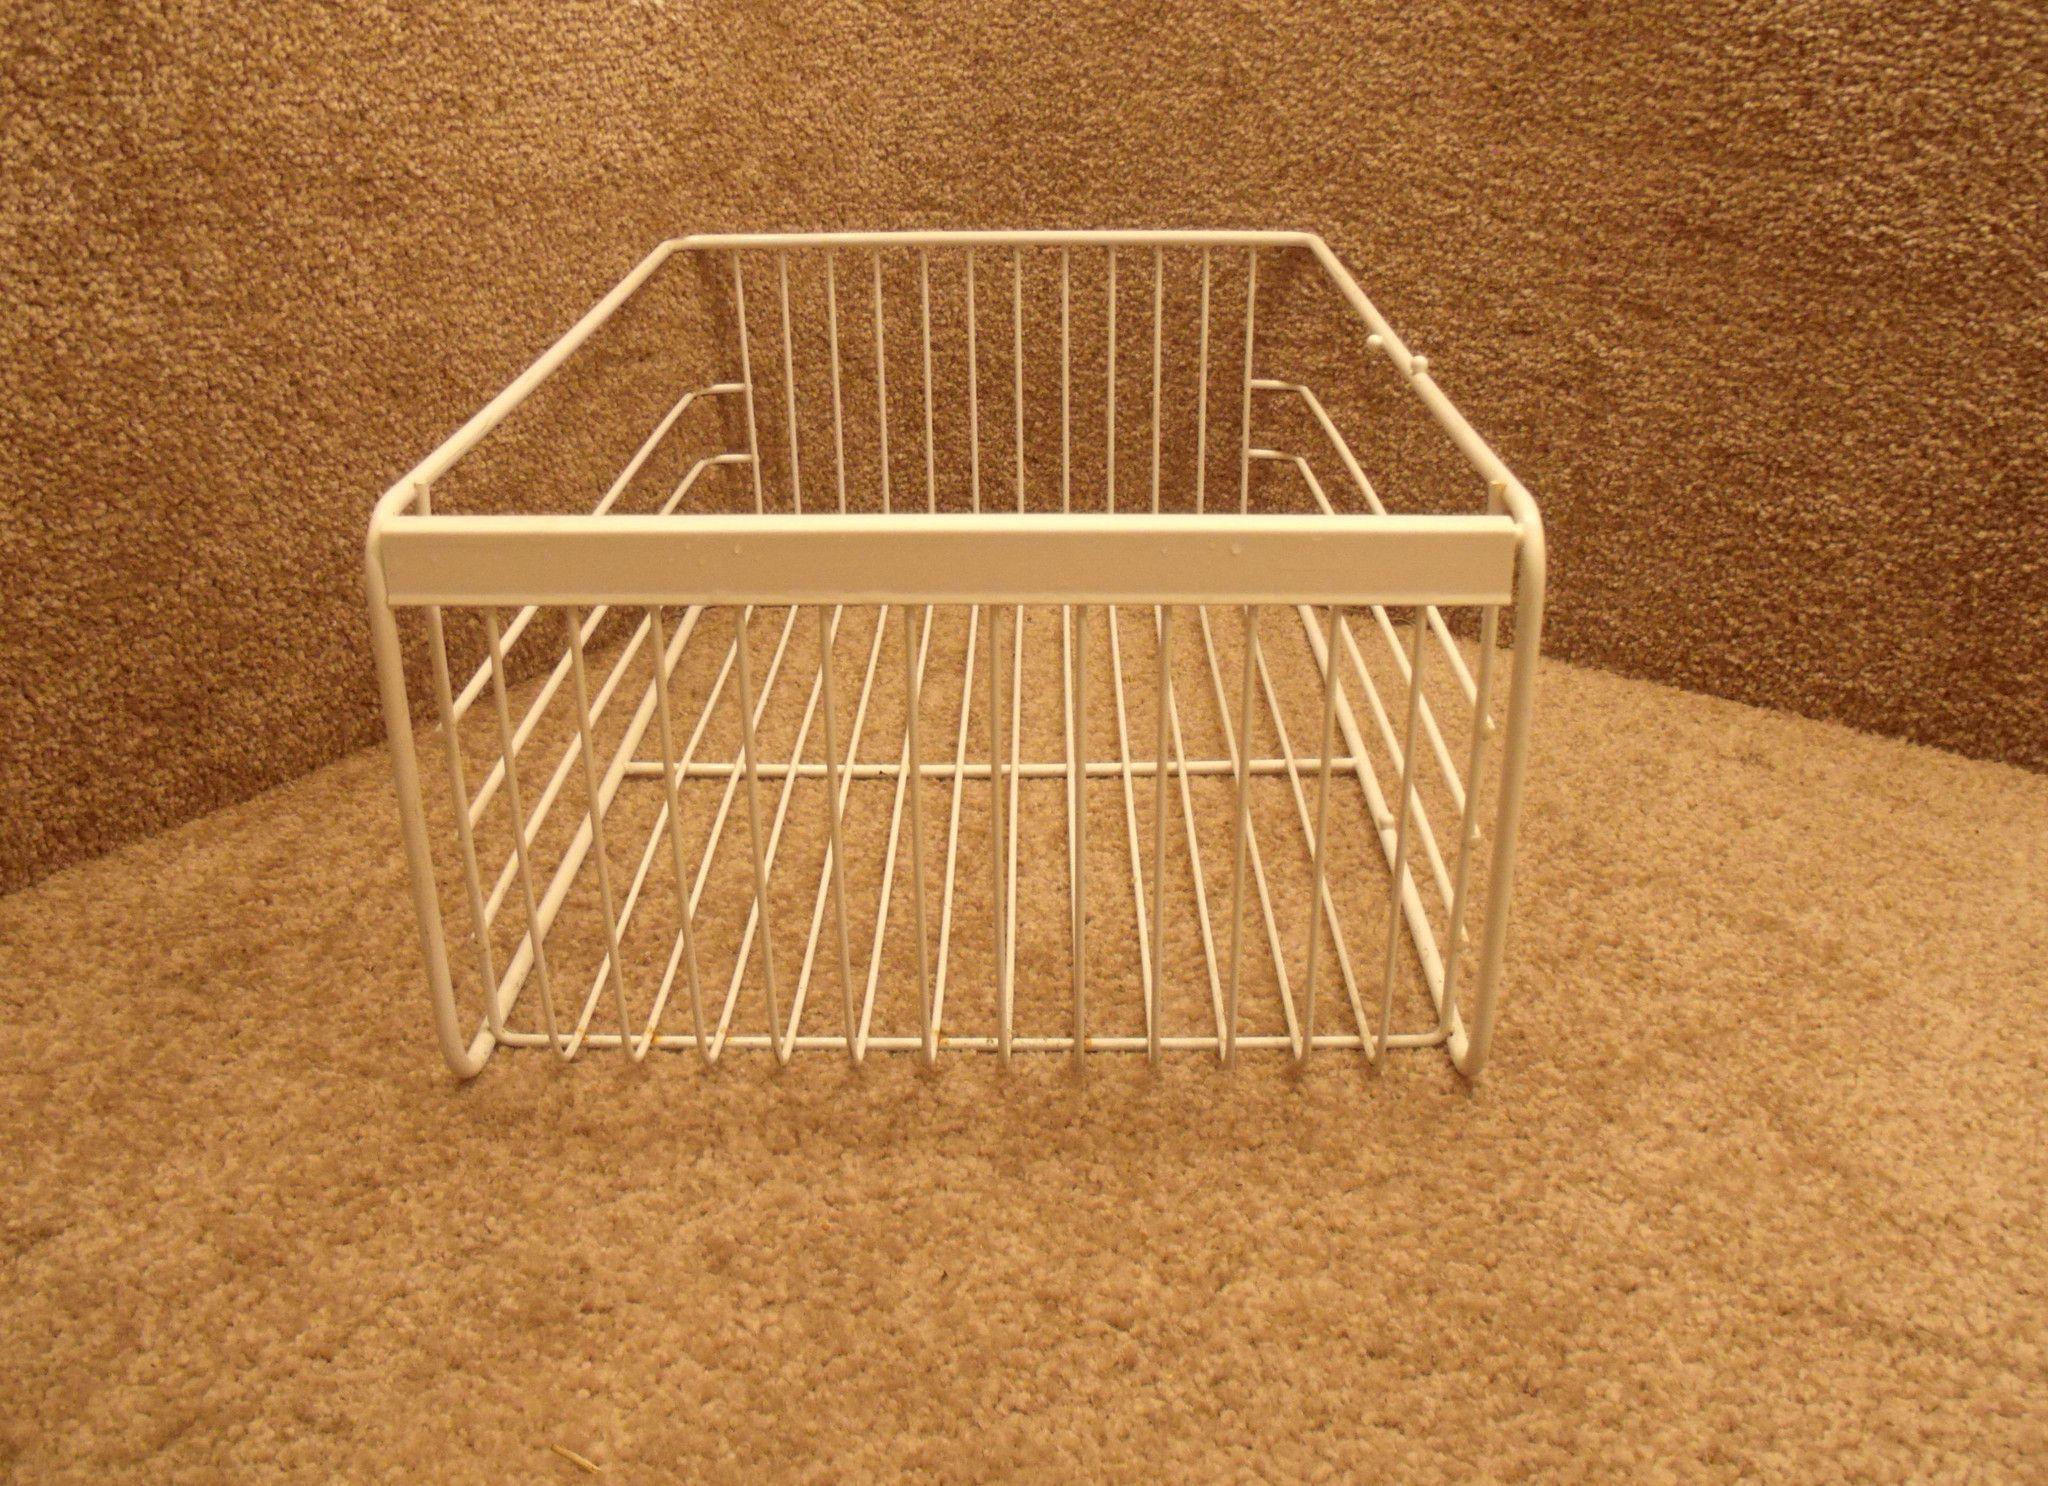 12011805 Kenmore Refrigerator Freezer Wire Basket Products Wiring Diagram Freezerless